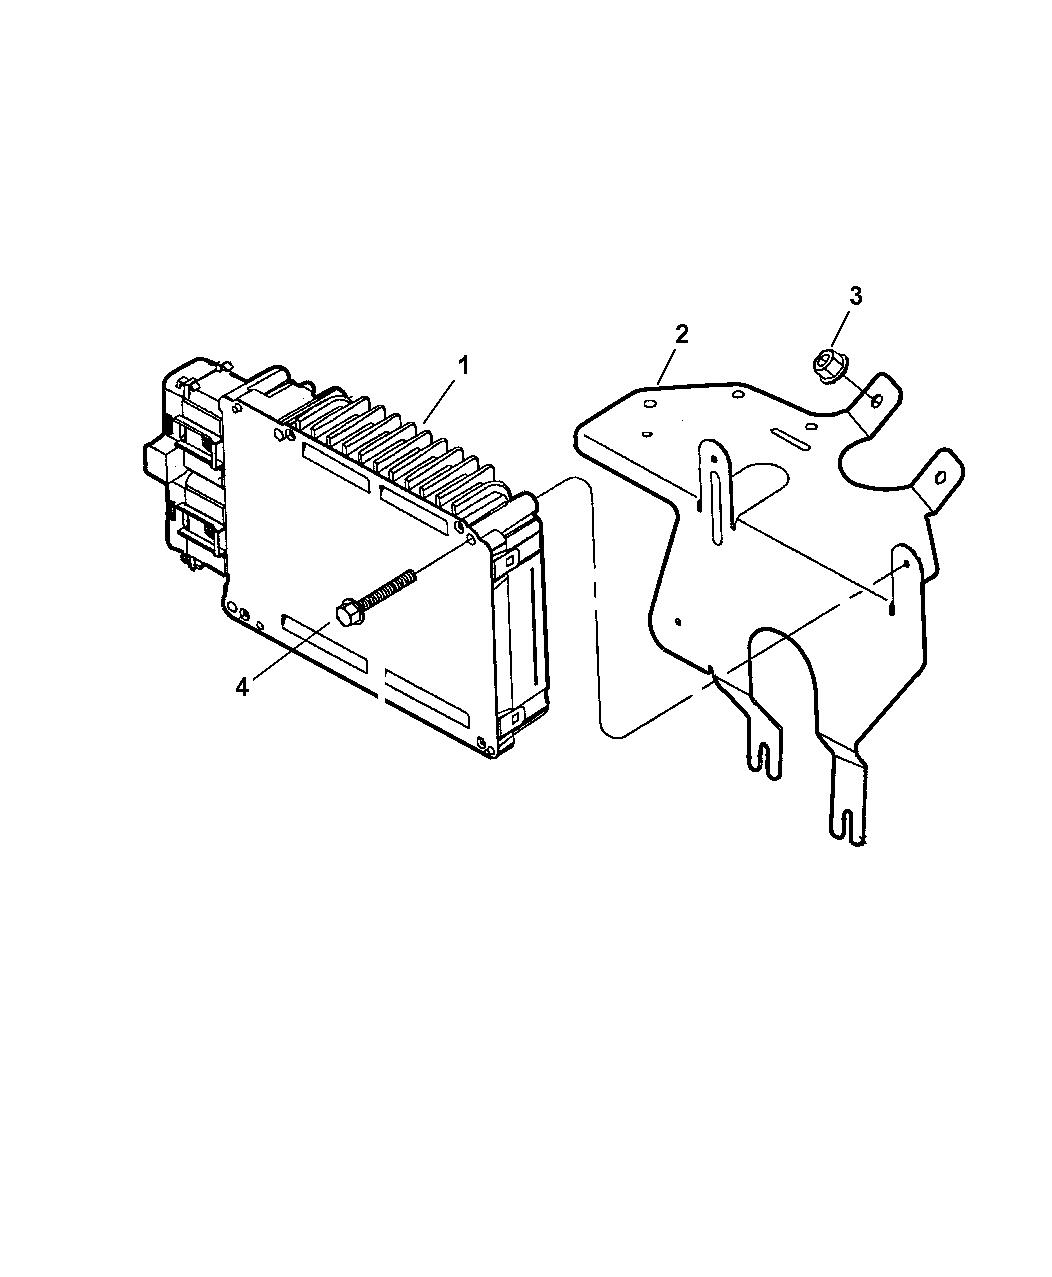 2006 Chrysler Pacifica Powertrain Control Module